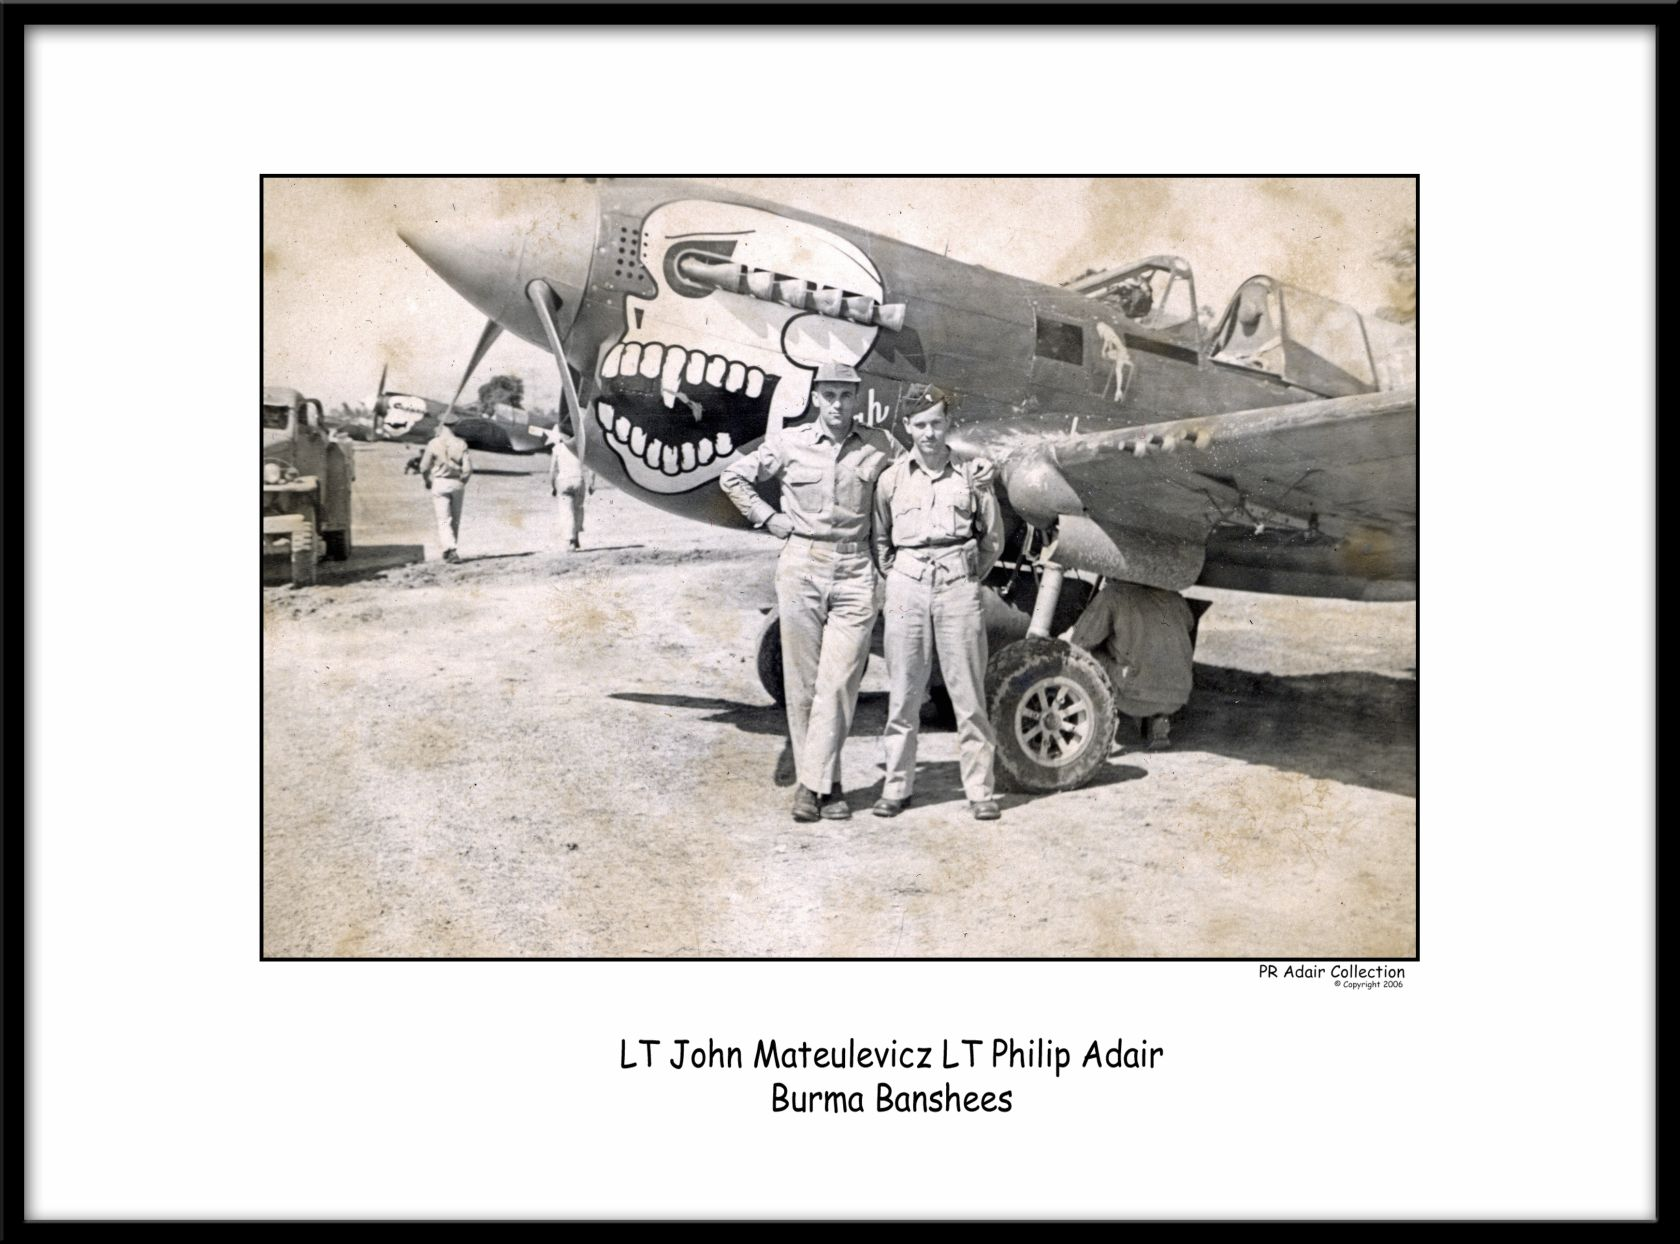 Burma Banshee 124